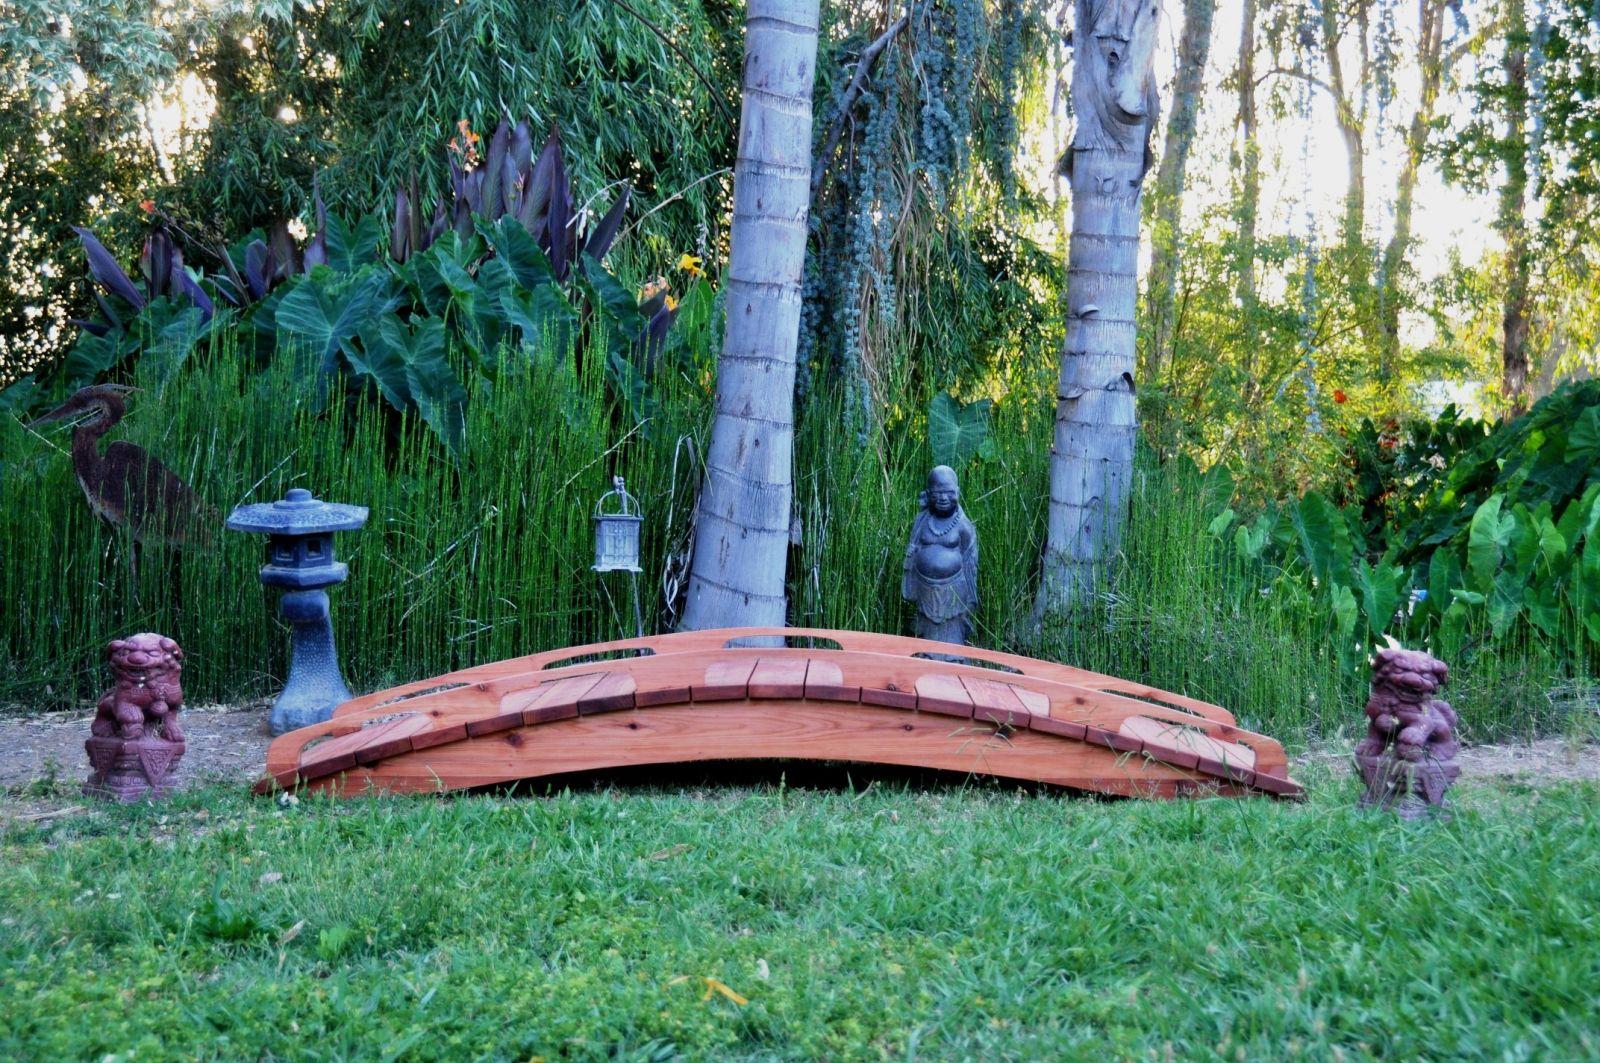 Delicieux Redwood Garden Bridges   Worlds Best In Design And Craftsmanship ! Japanese Garden  Bridges 4 20ft